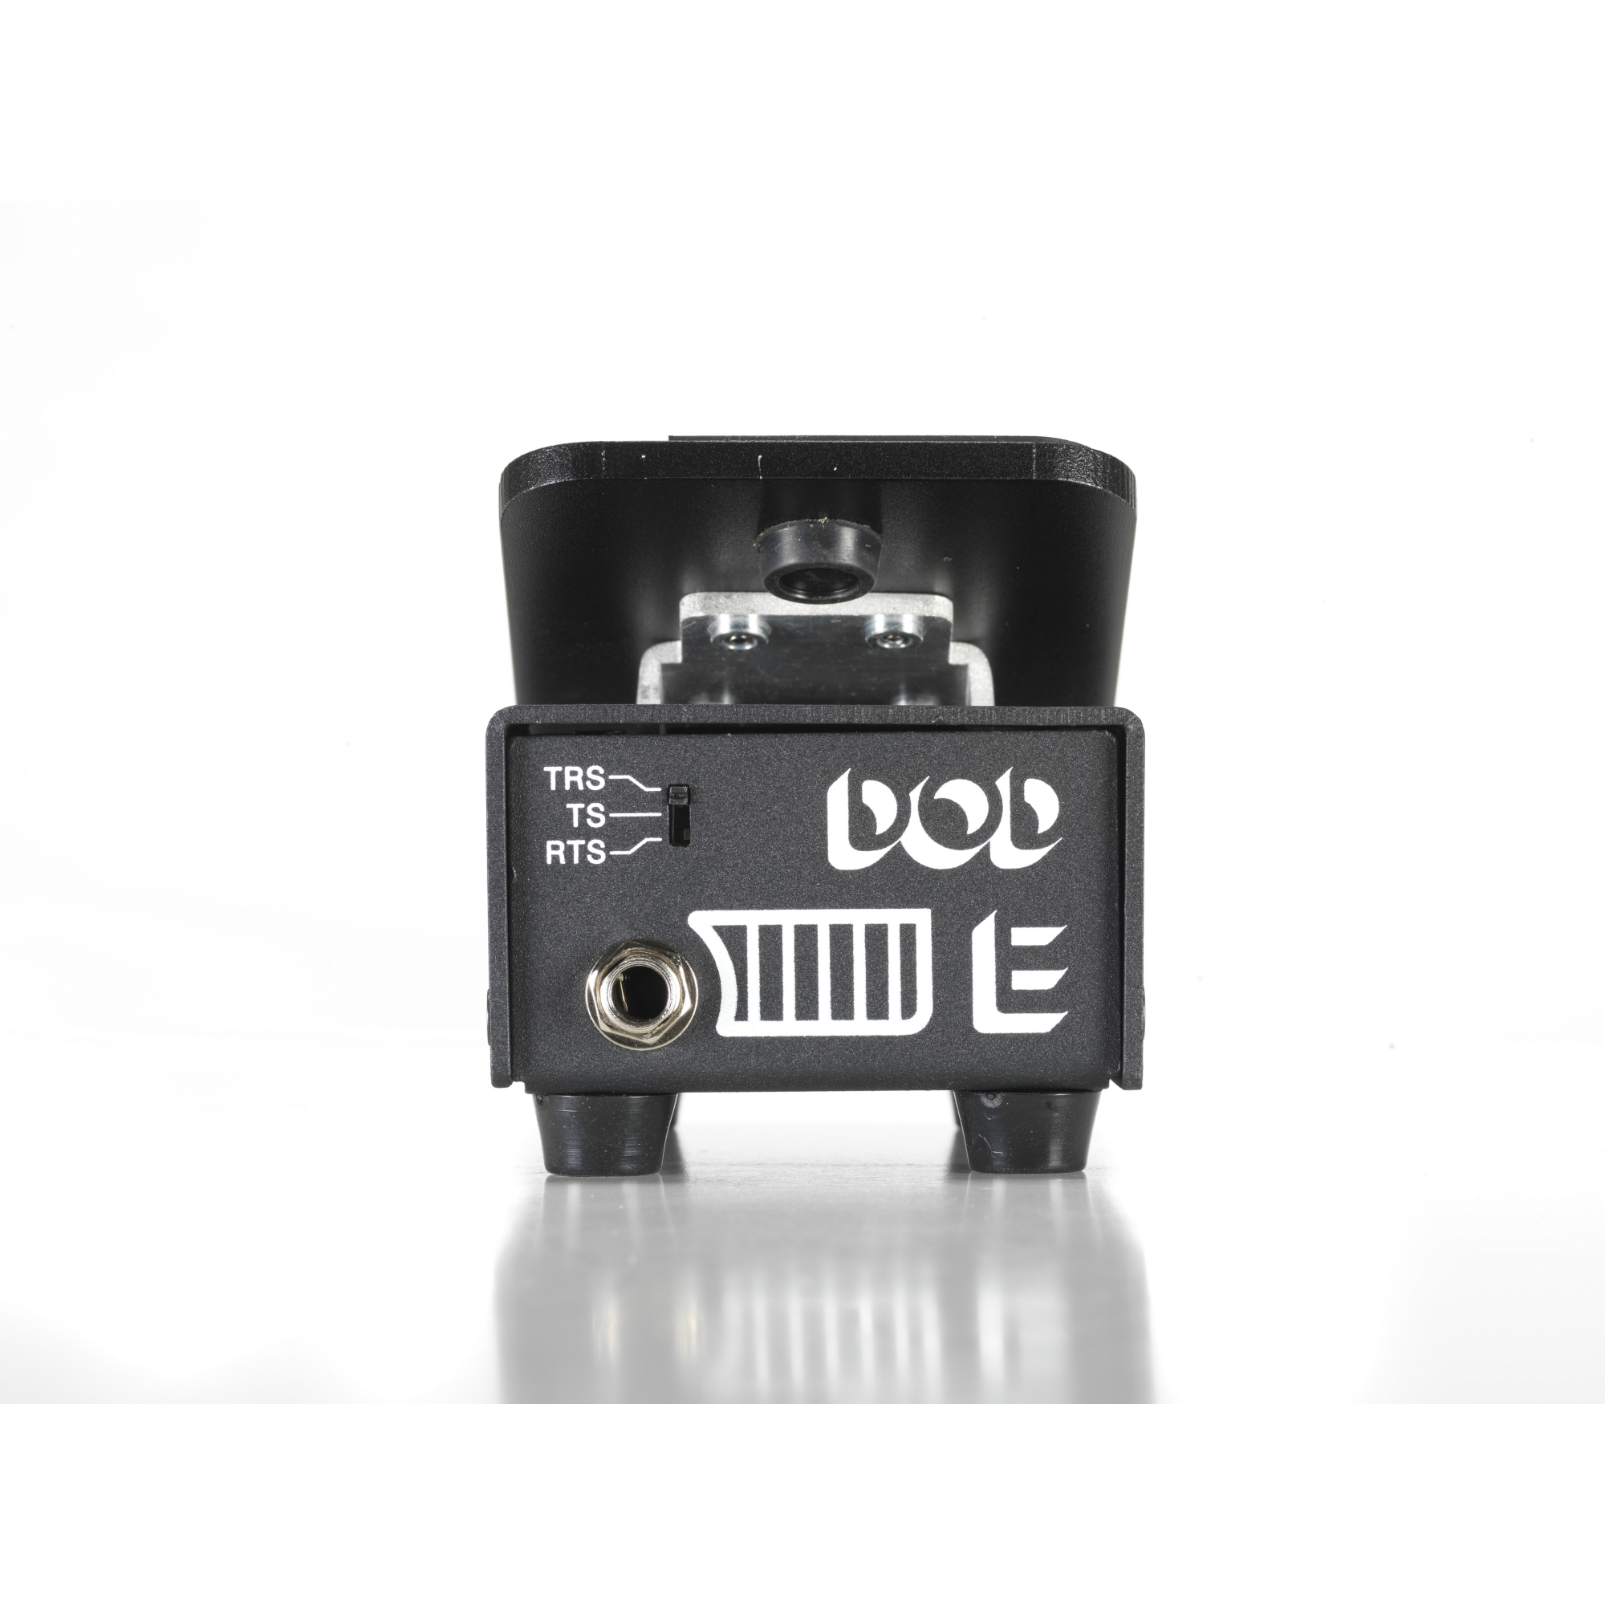 DOD Mini Expression - Black - Expression Pedal - Back